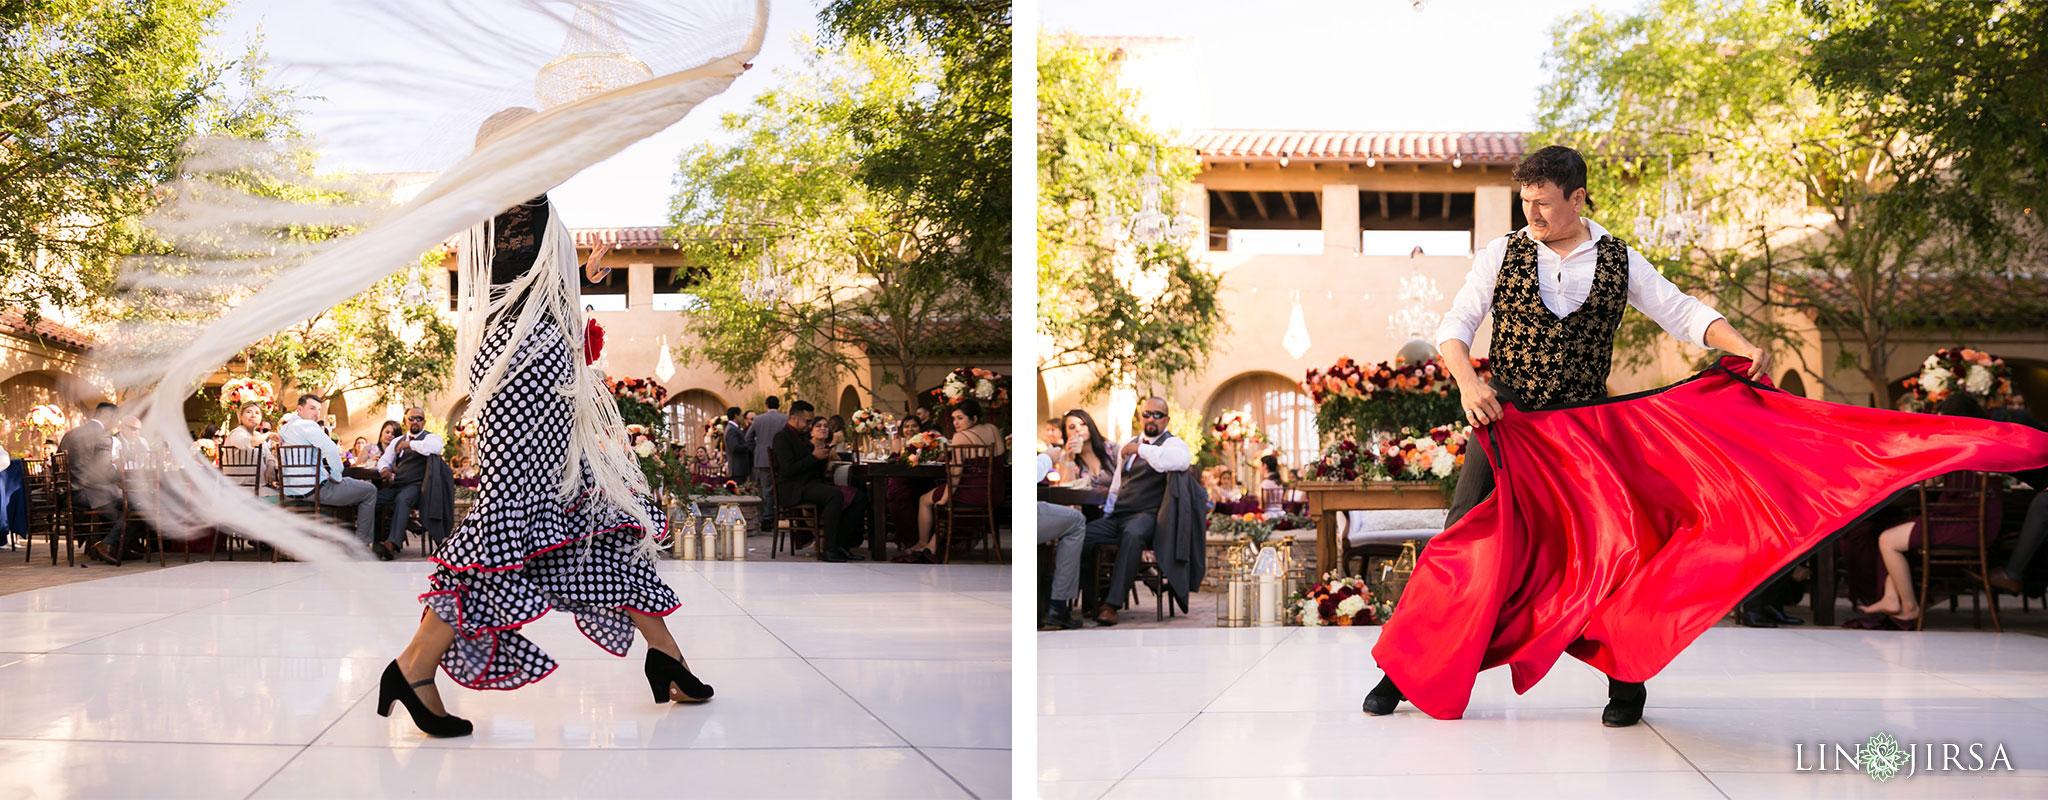 36 serra plaza san juan capistrano wedding ceremony photography